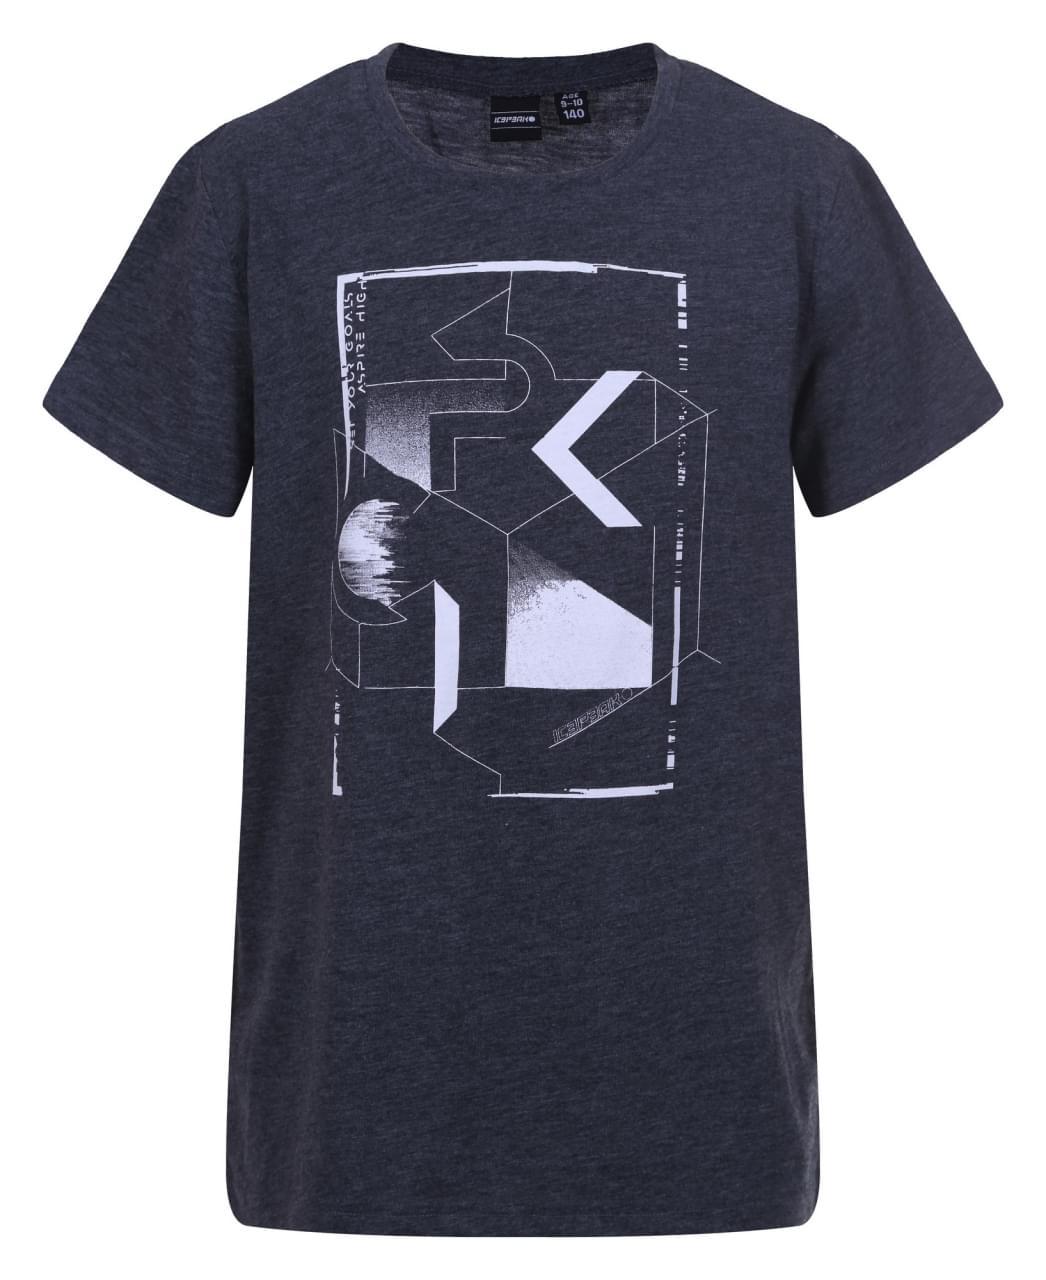 Icepeak Tate T-Shirt Kids